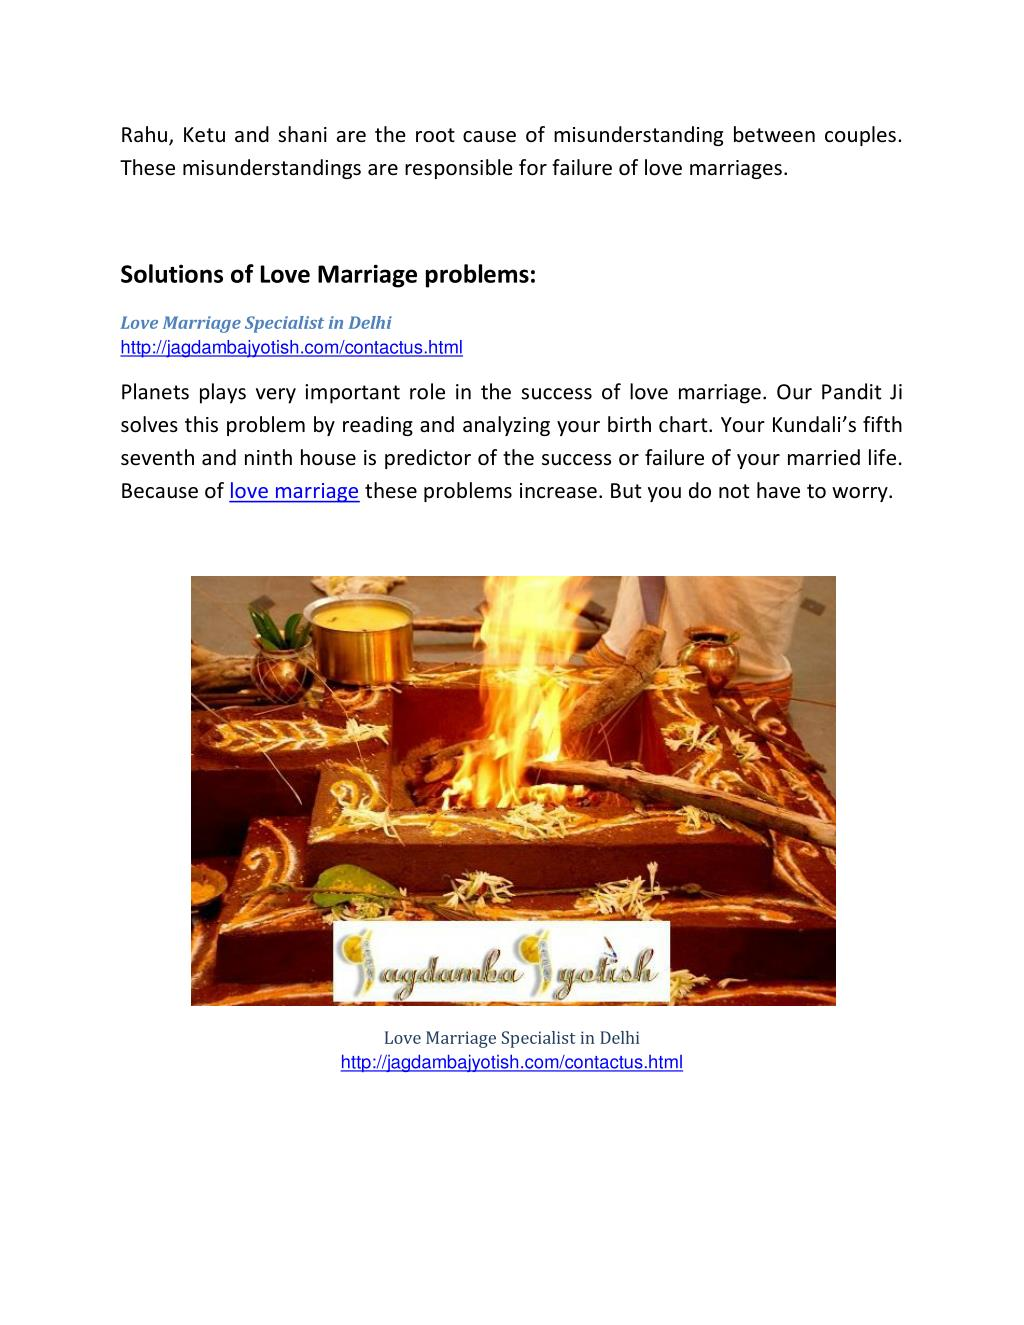 PPT - Love marriage specialist in delhi-best astrology